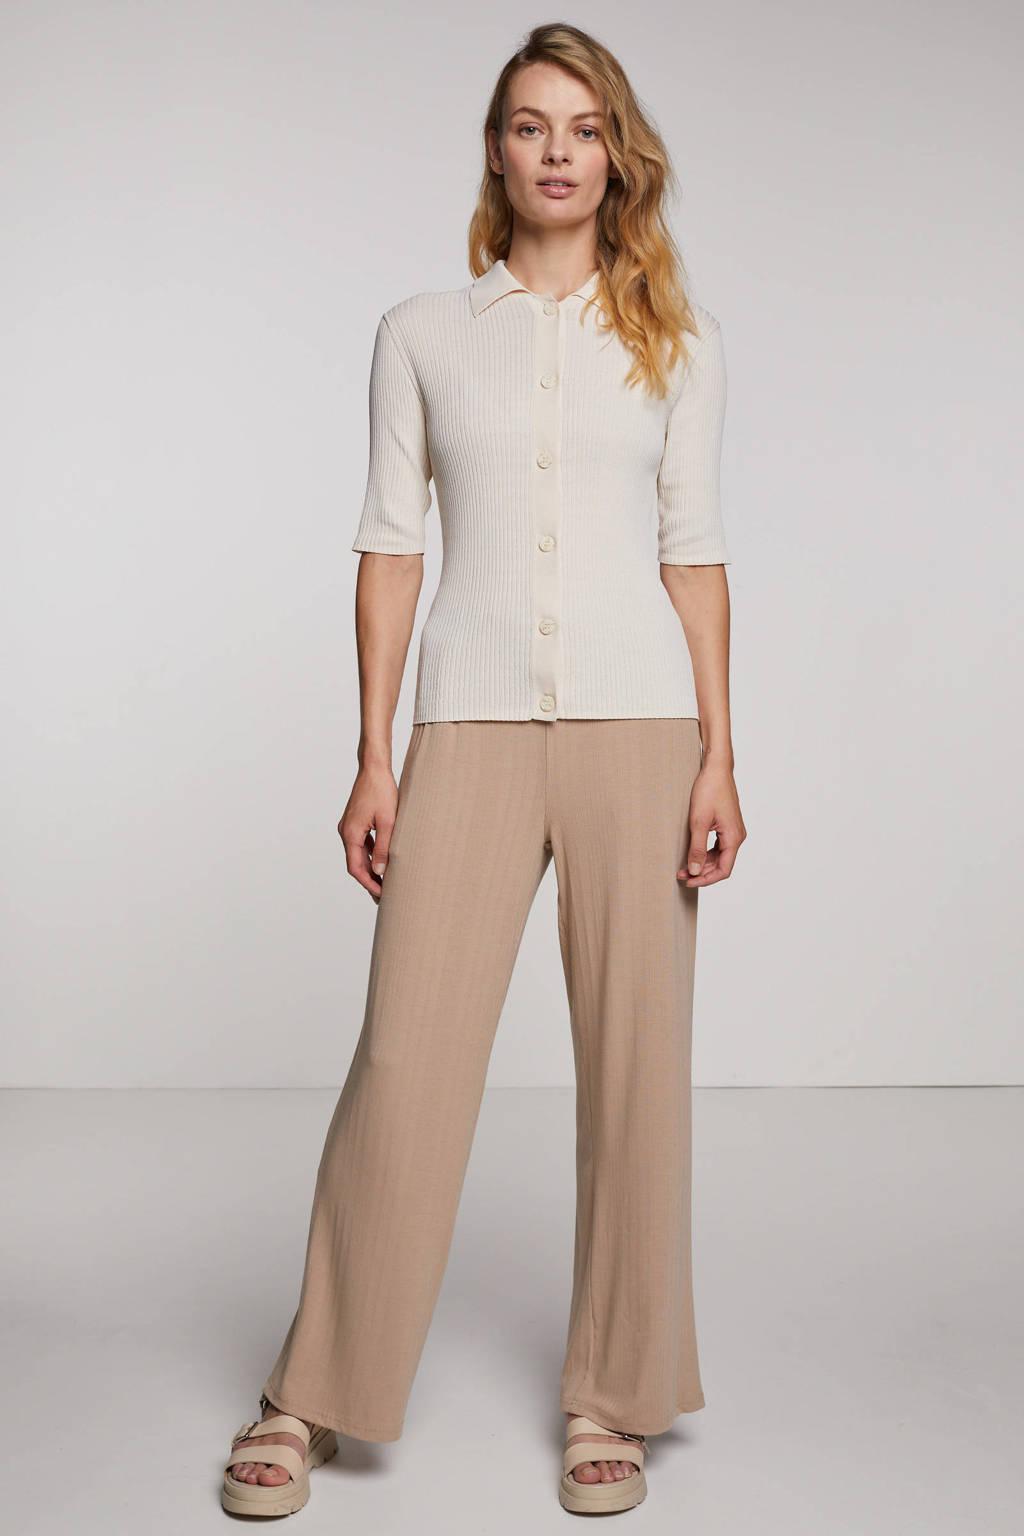 Minimum high waist wide leg palazzo broek Yarsa met textuur beige, Beige